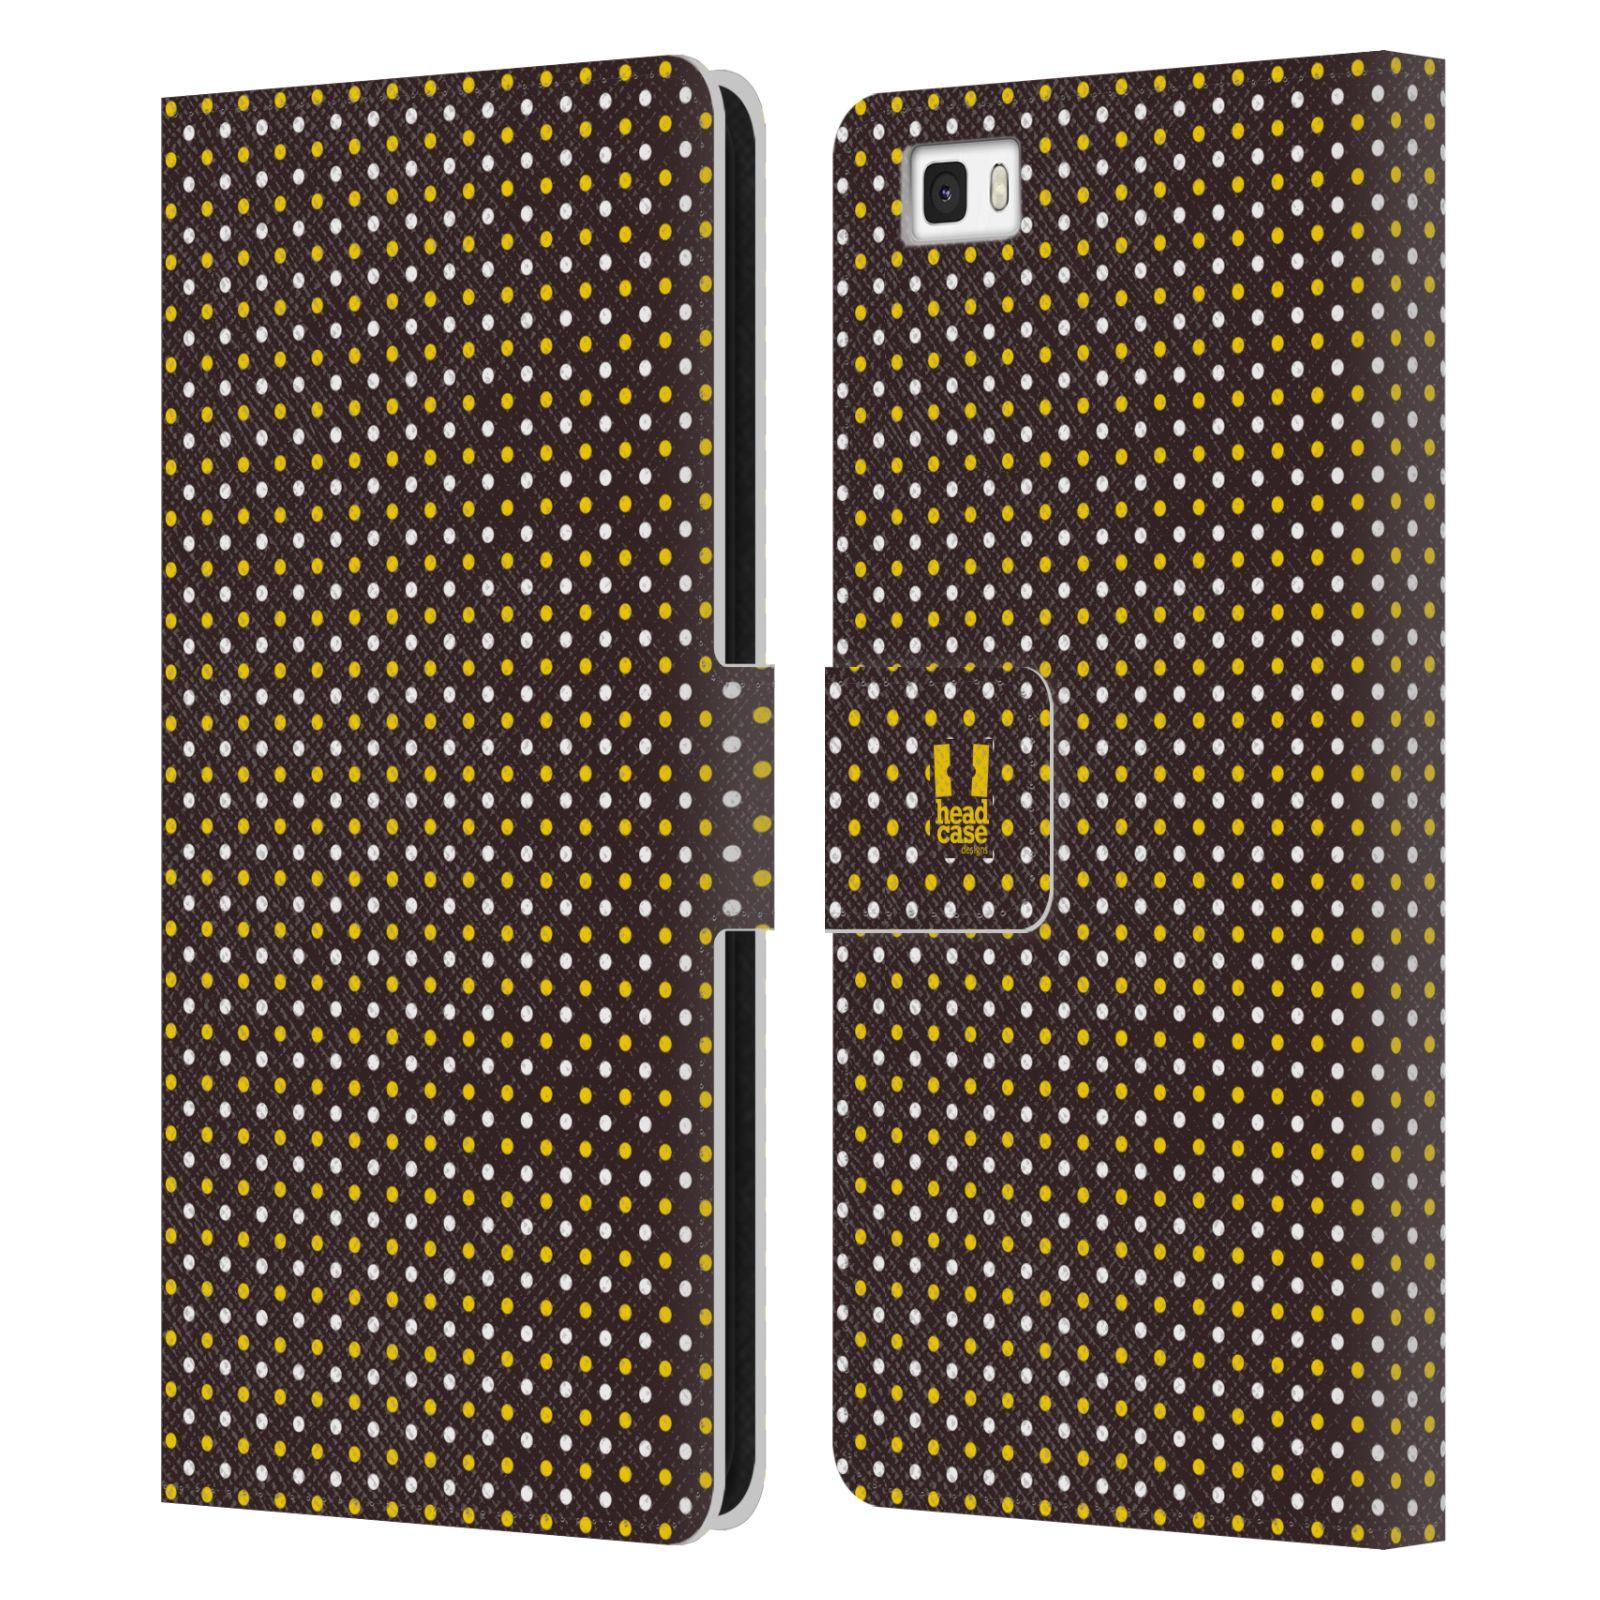 HEAD CASE Flipové pouzdro pro mobil Huawei P8 LITE VČELÍ VZOR puntíky hnědá a žlutá